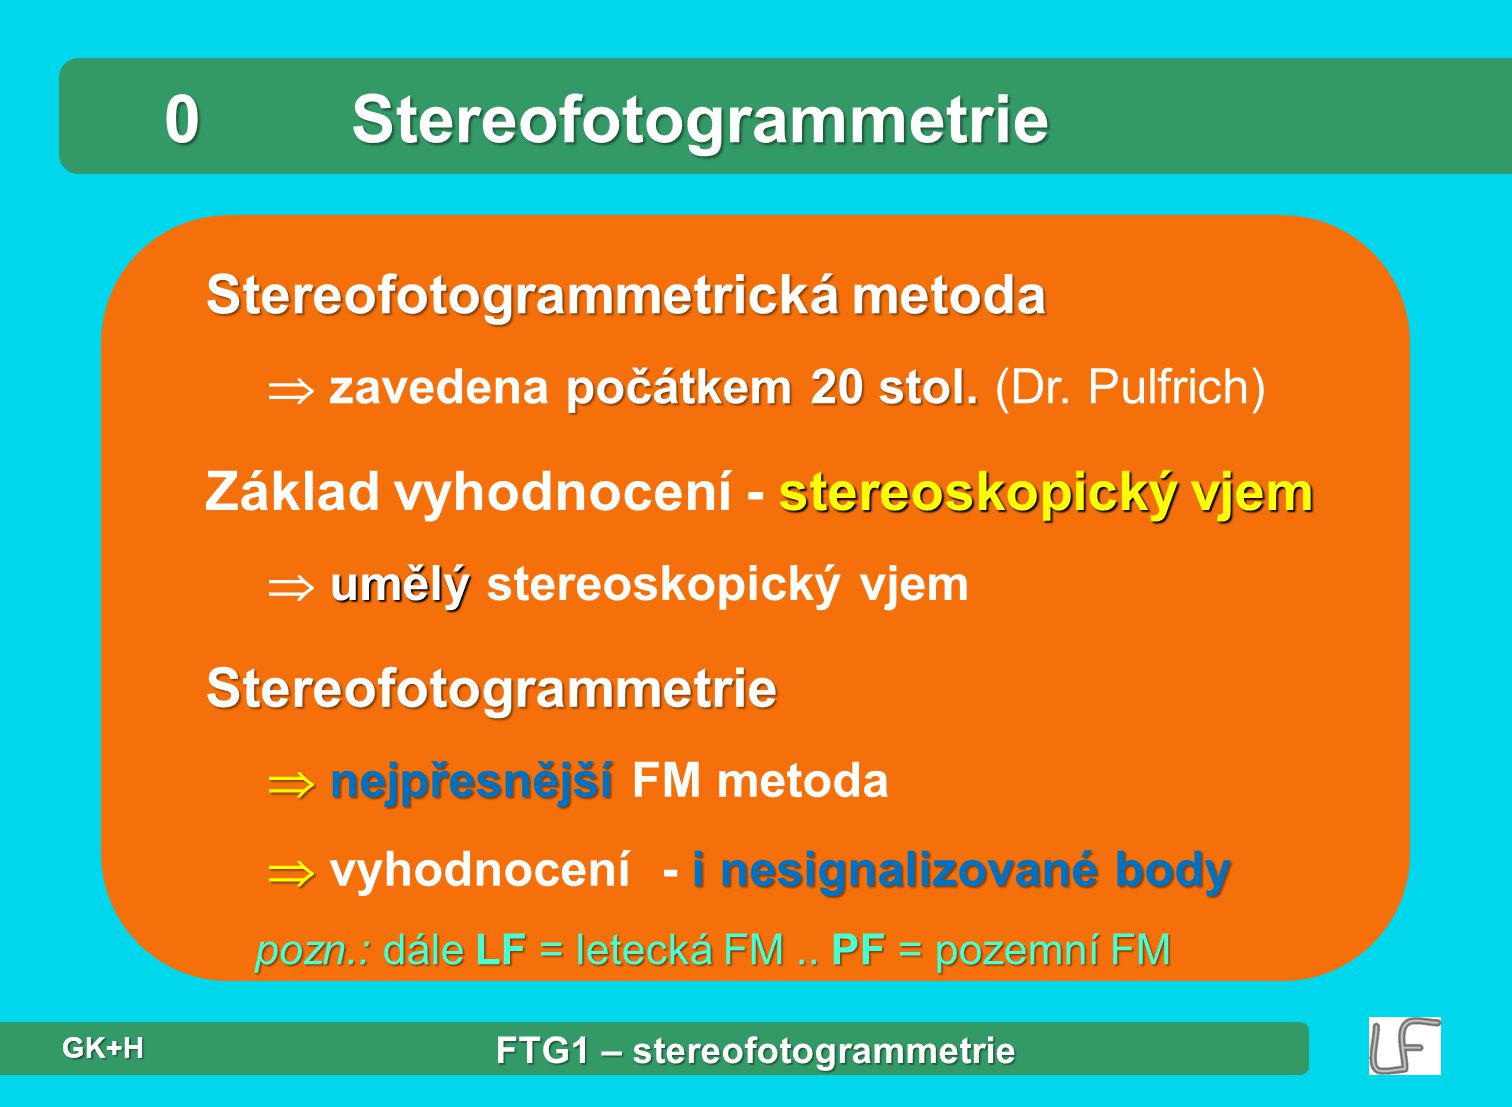 0 Stereofotogrammetrie